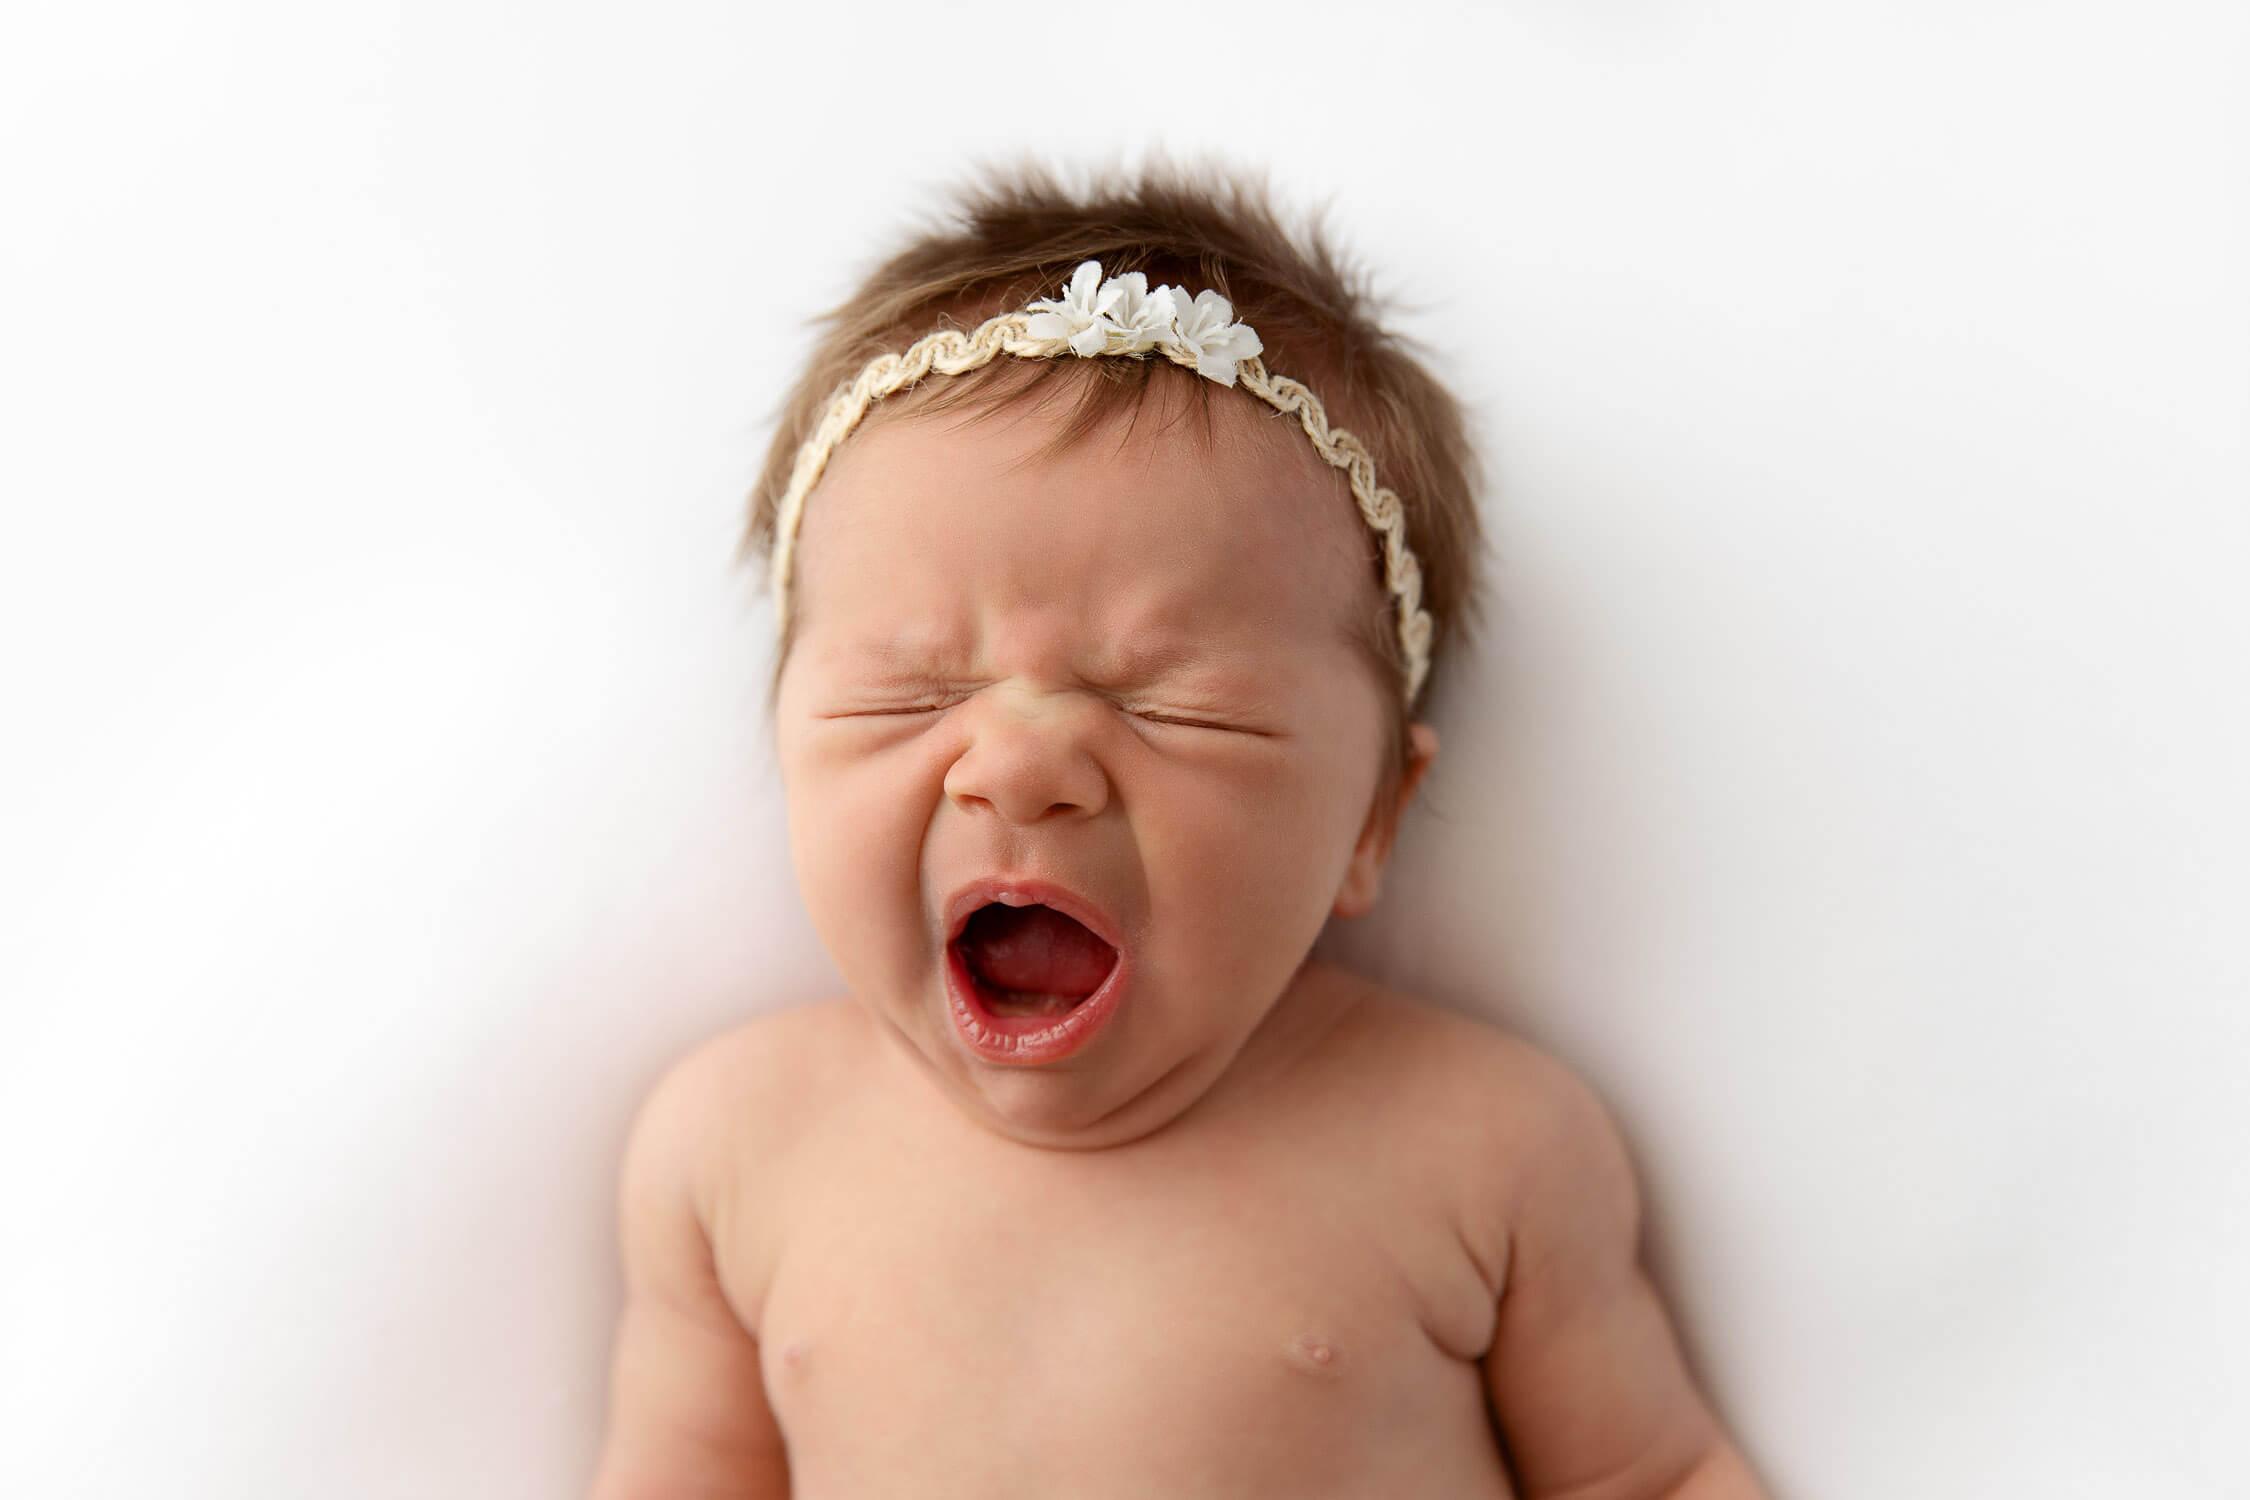 closeup of newborn baby girl yawning on a white blanket